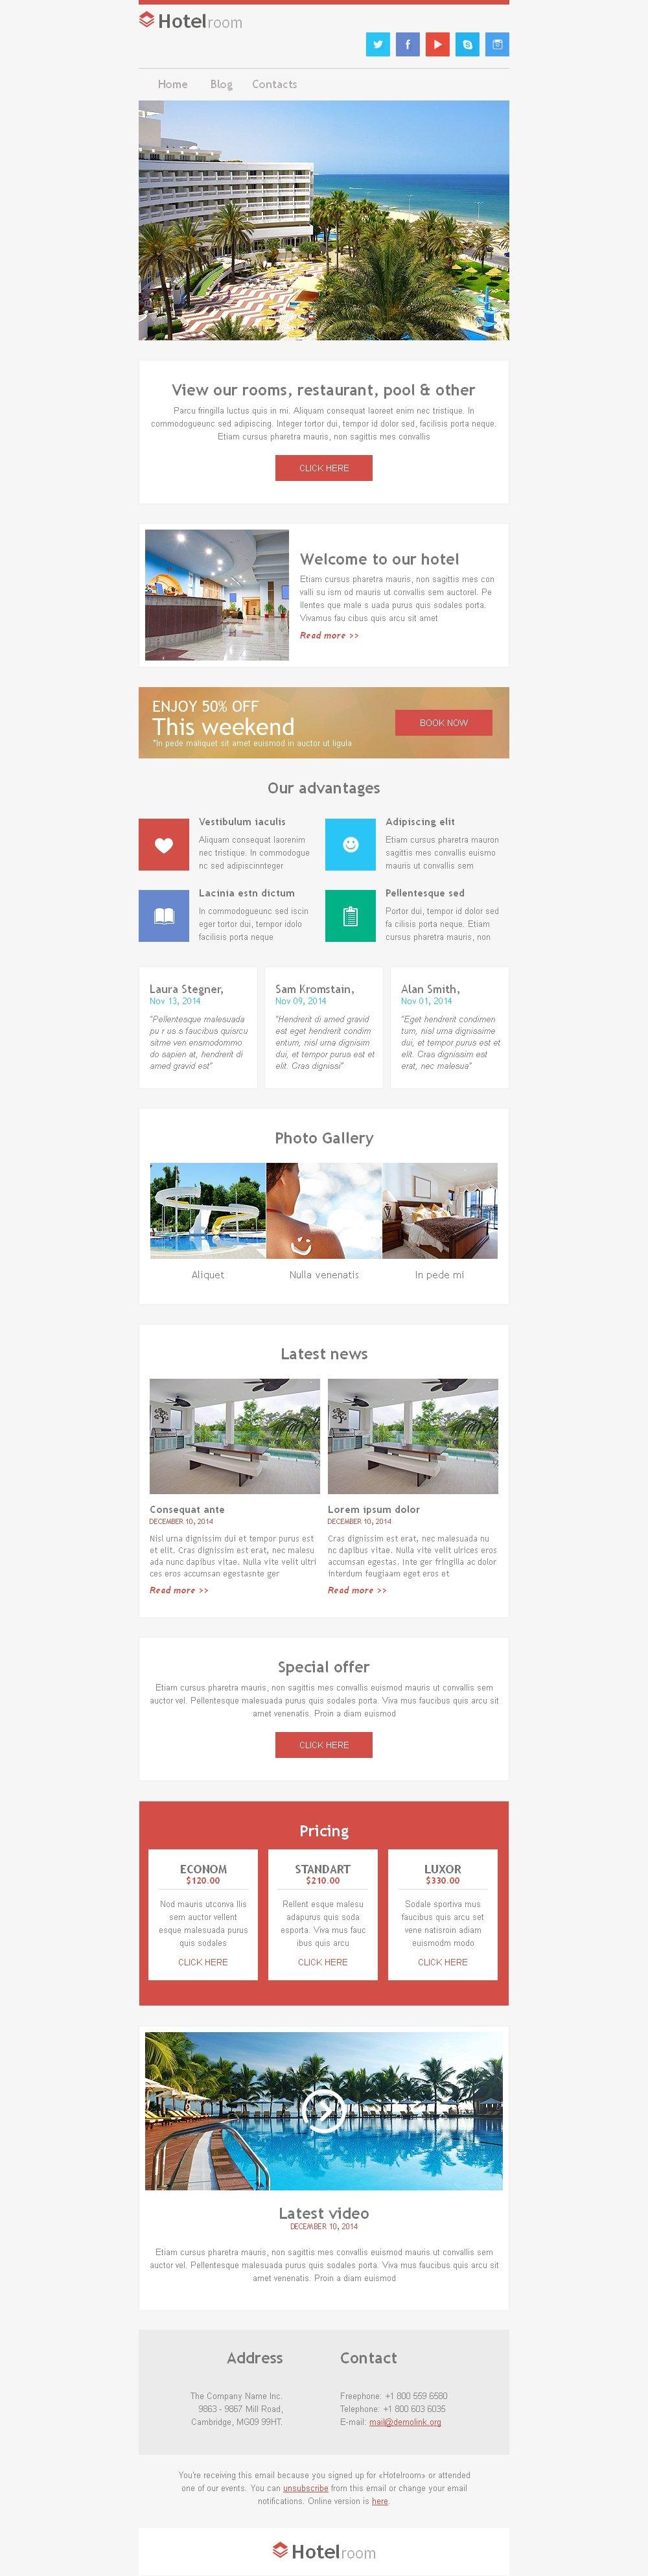 Template de Newsletter Flexível para Sites de Hotéis №49296